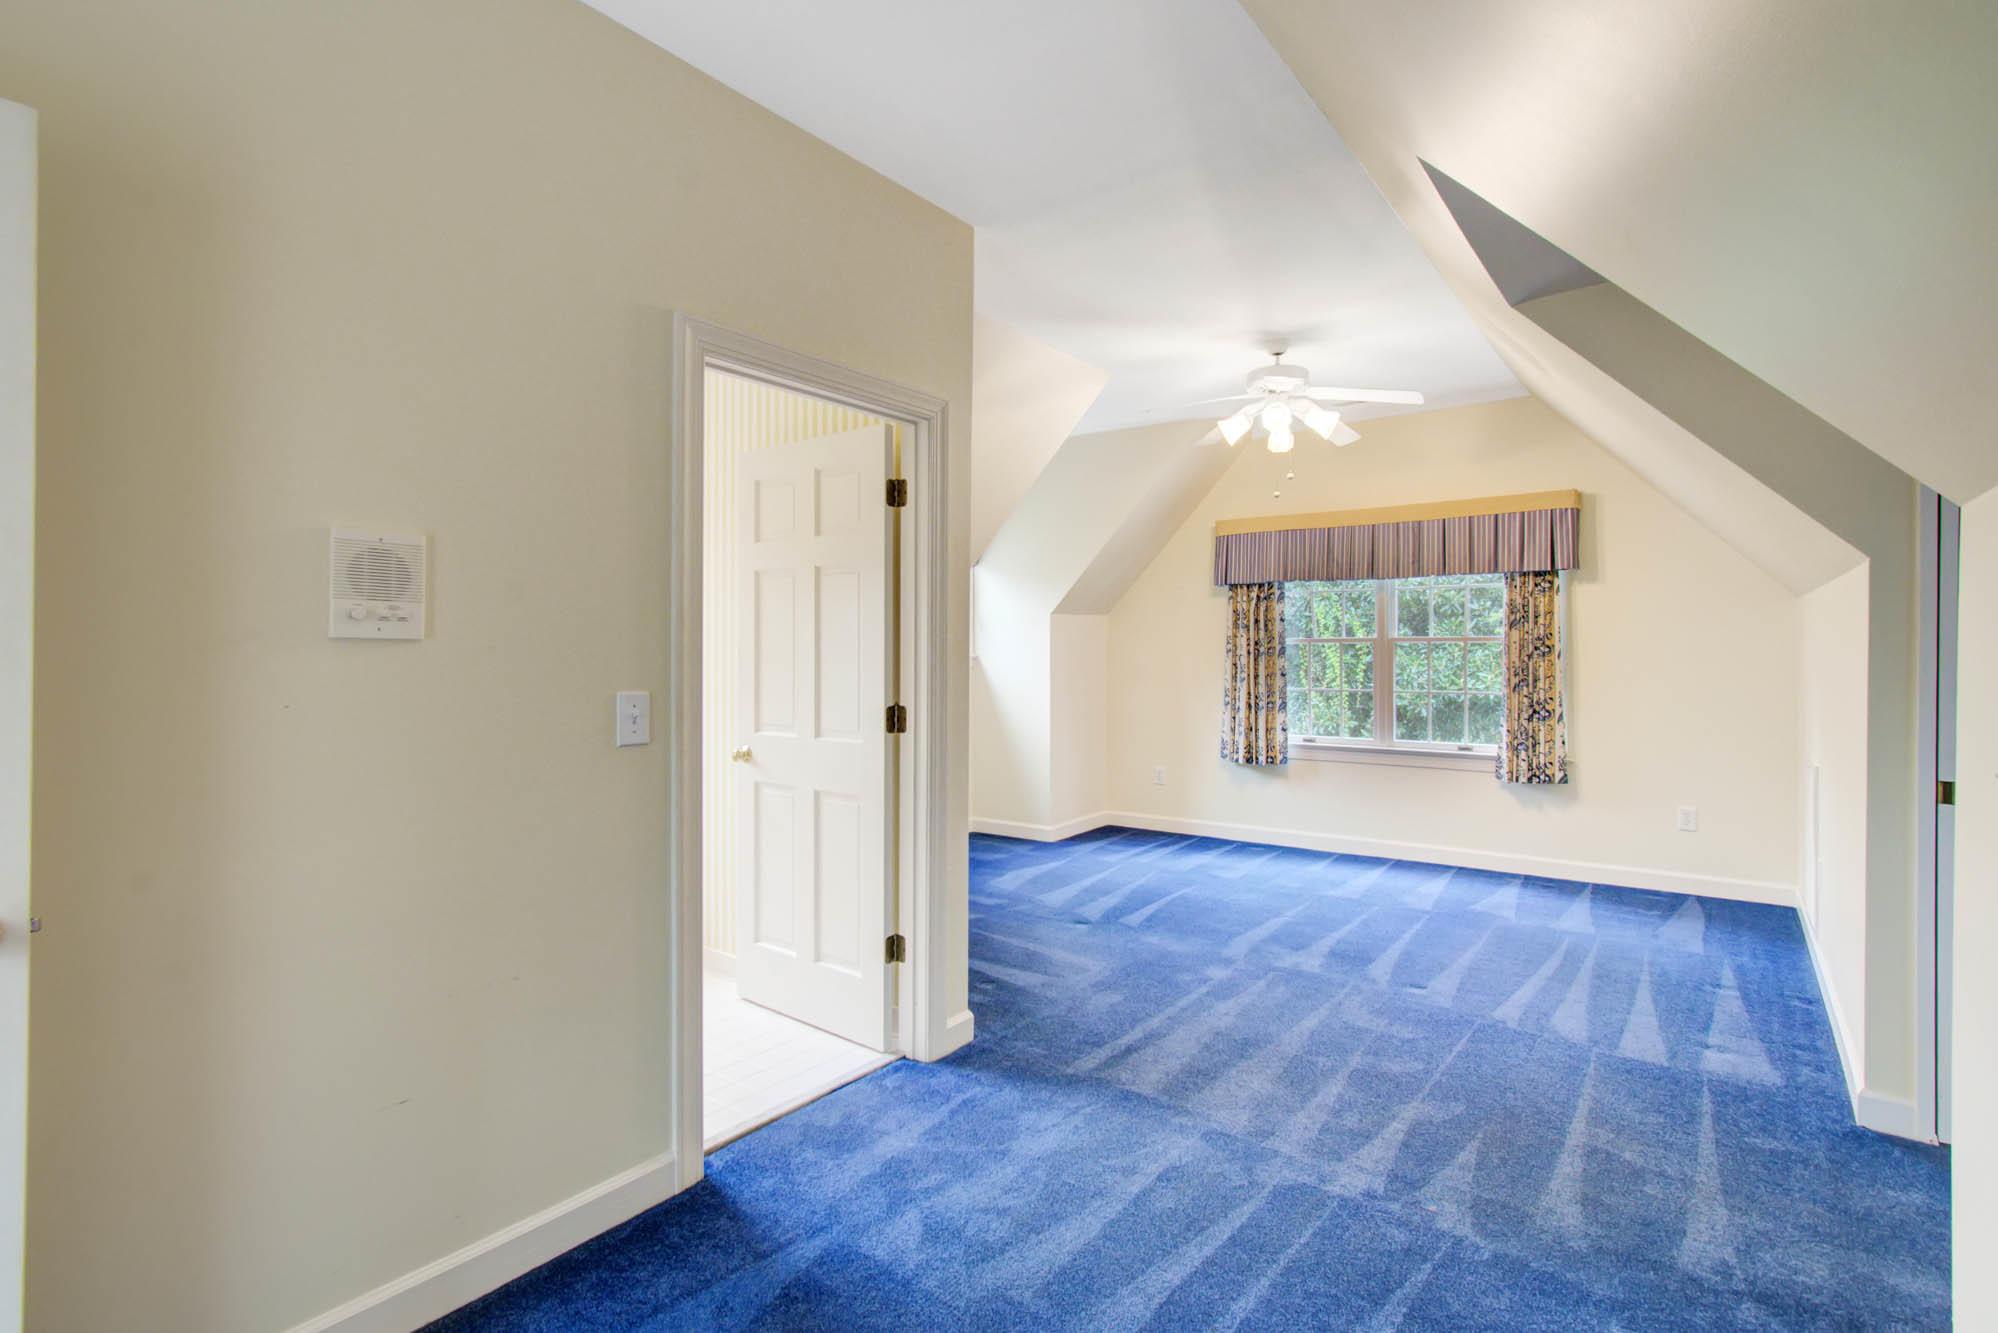 Dunes West Homes For Sale - 3515 Colonel Vanderhorst, Mount Pleasant, SC - 13